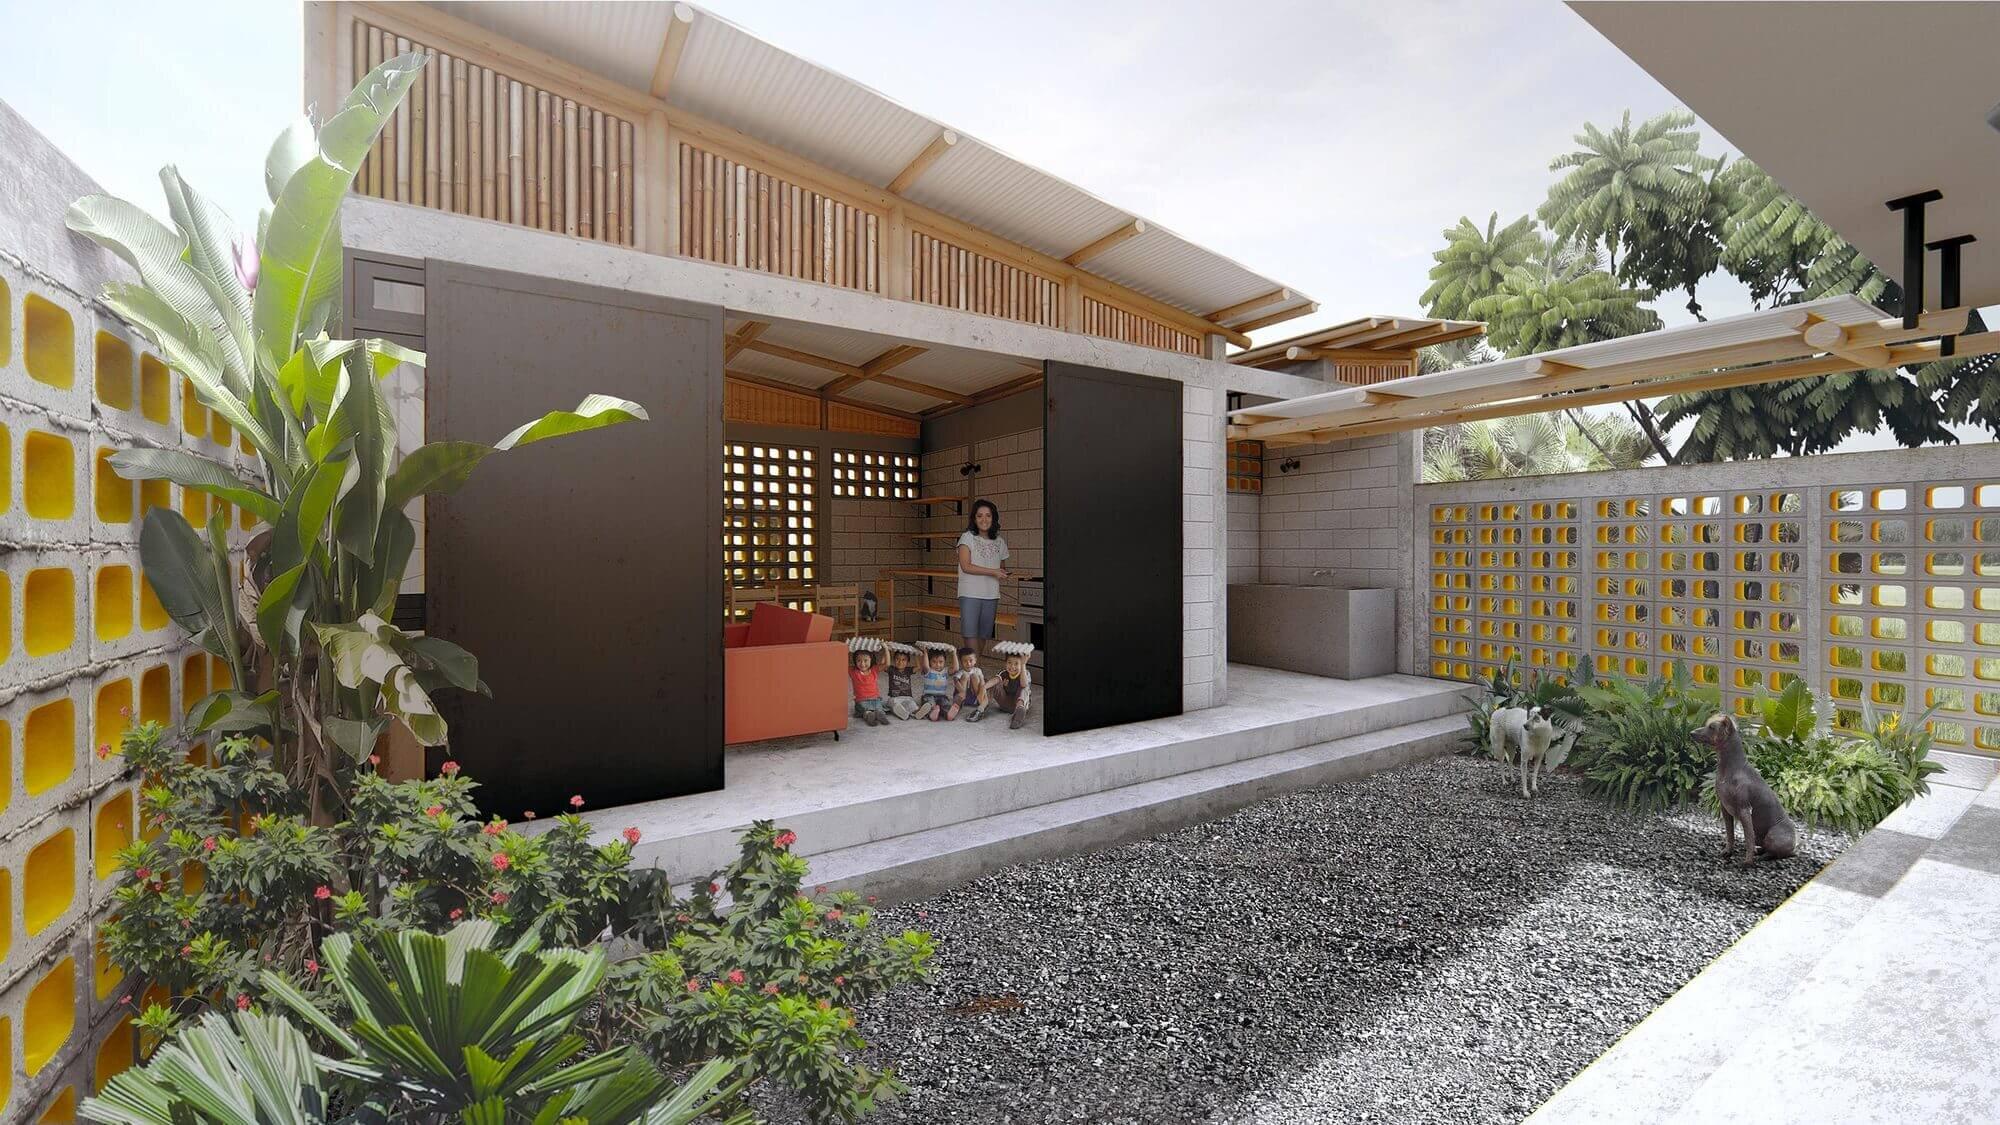 Plan-B-Guatemala-DEOC-Arquitectos-Guatemala-21